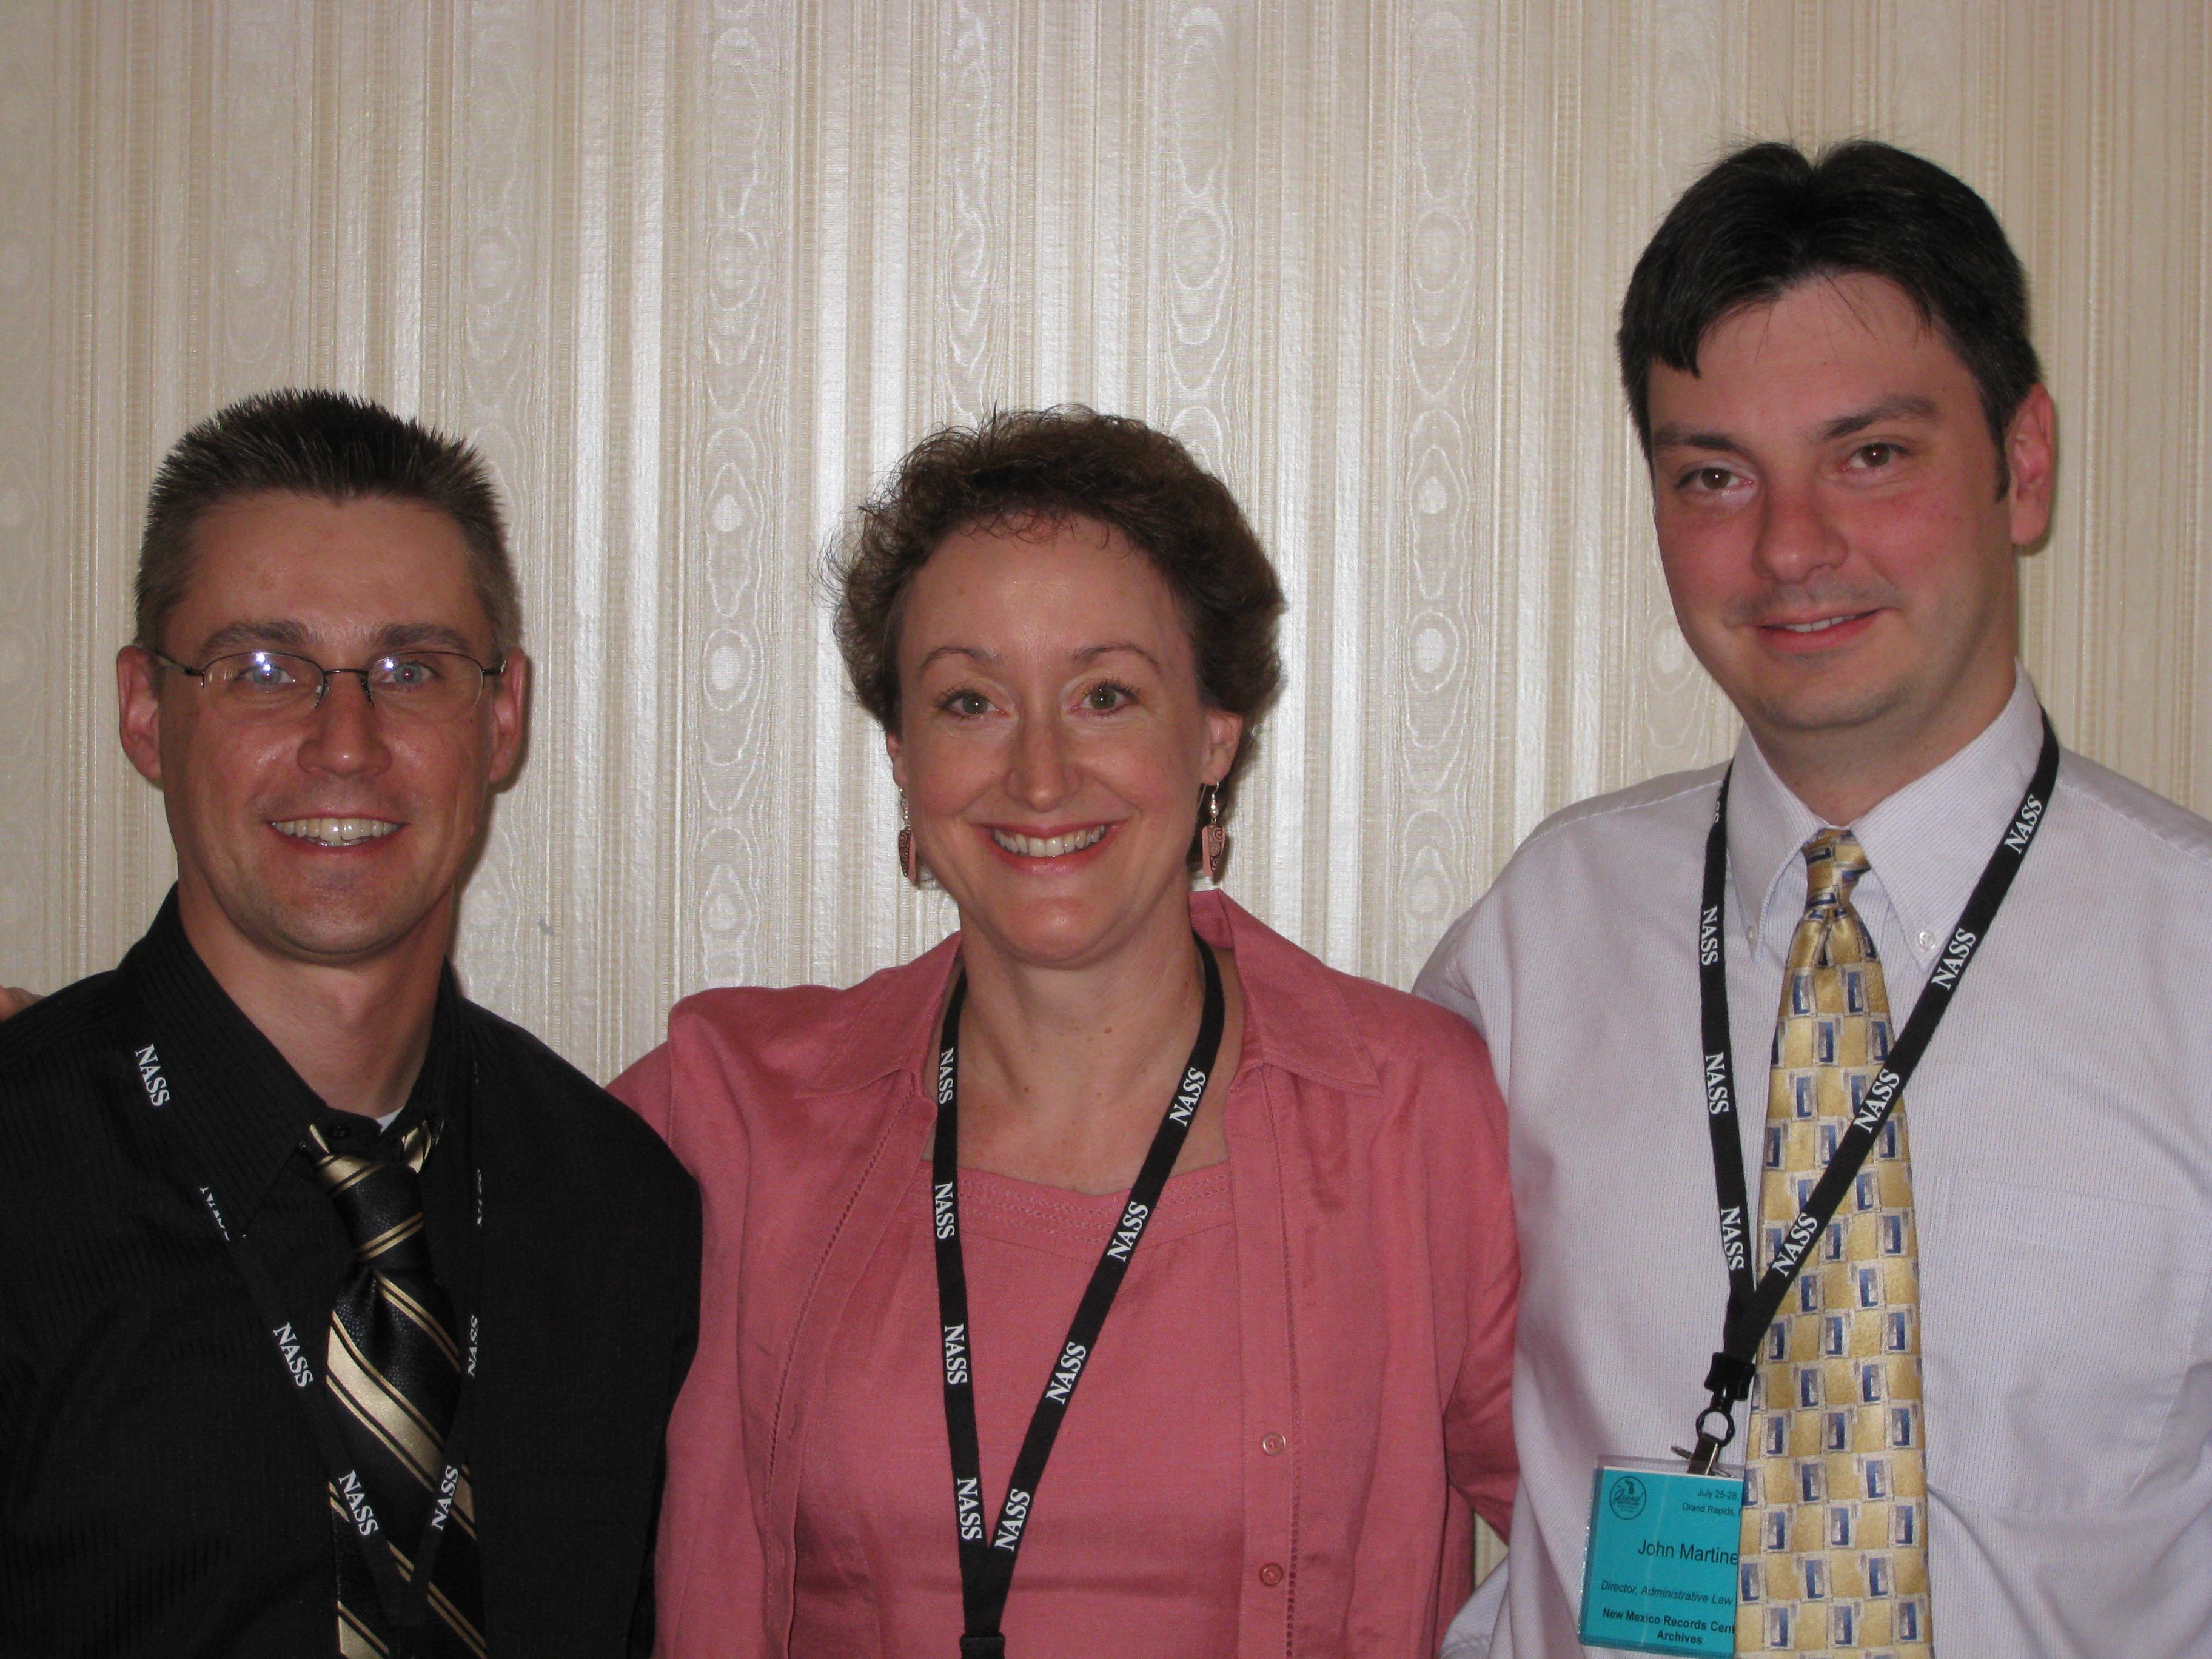 Scott Cancelosi (AZ), Julie Yamaka (OR), and John Martinez (NM)